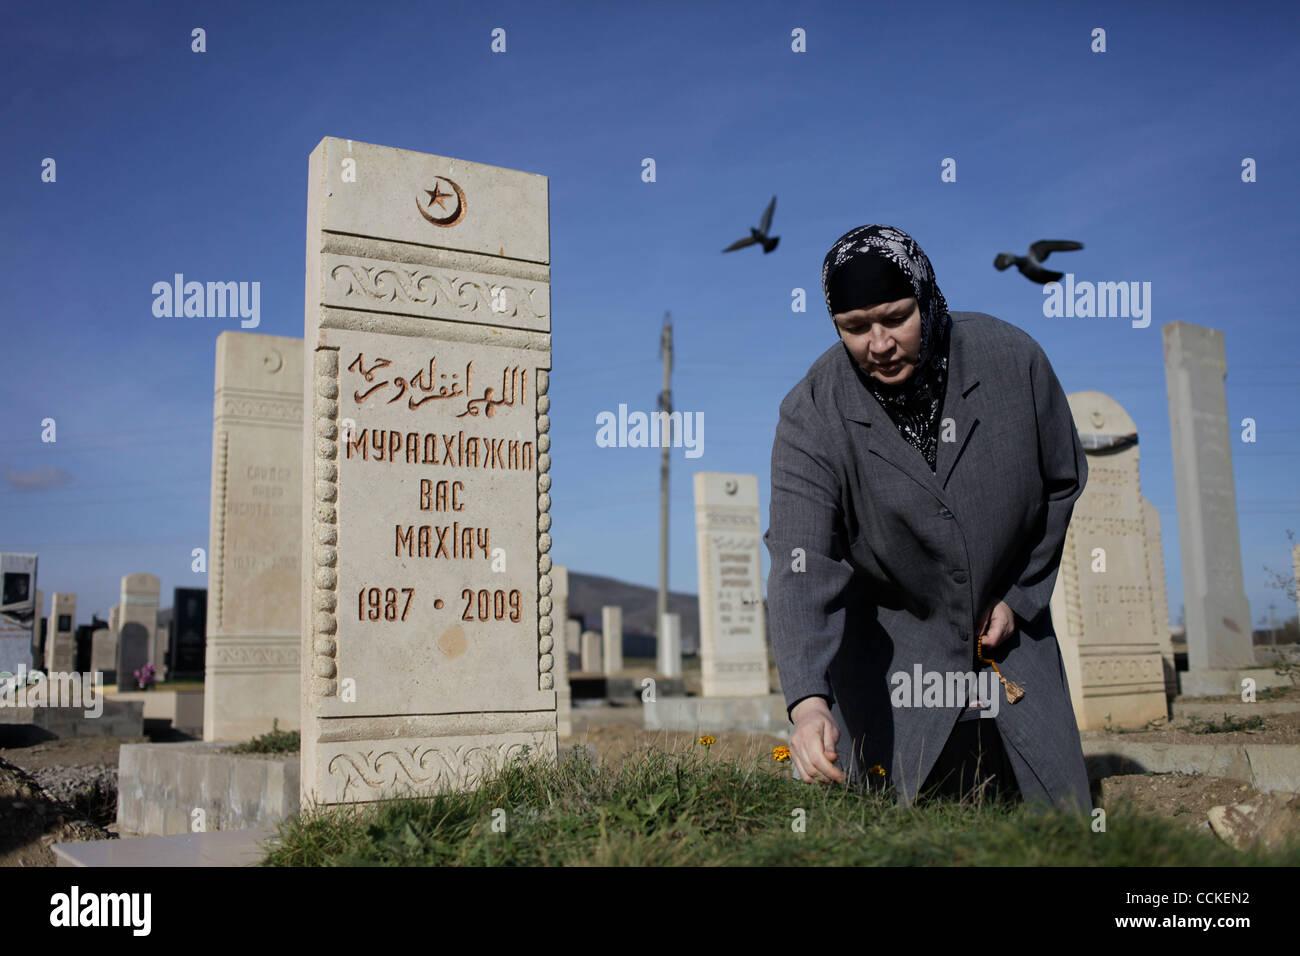 Dagestan surnames and names. Beautiful Dagestan surnames 94